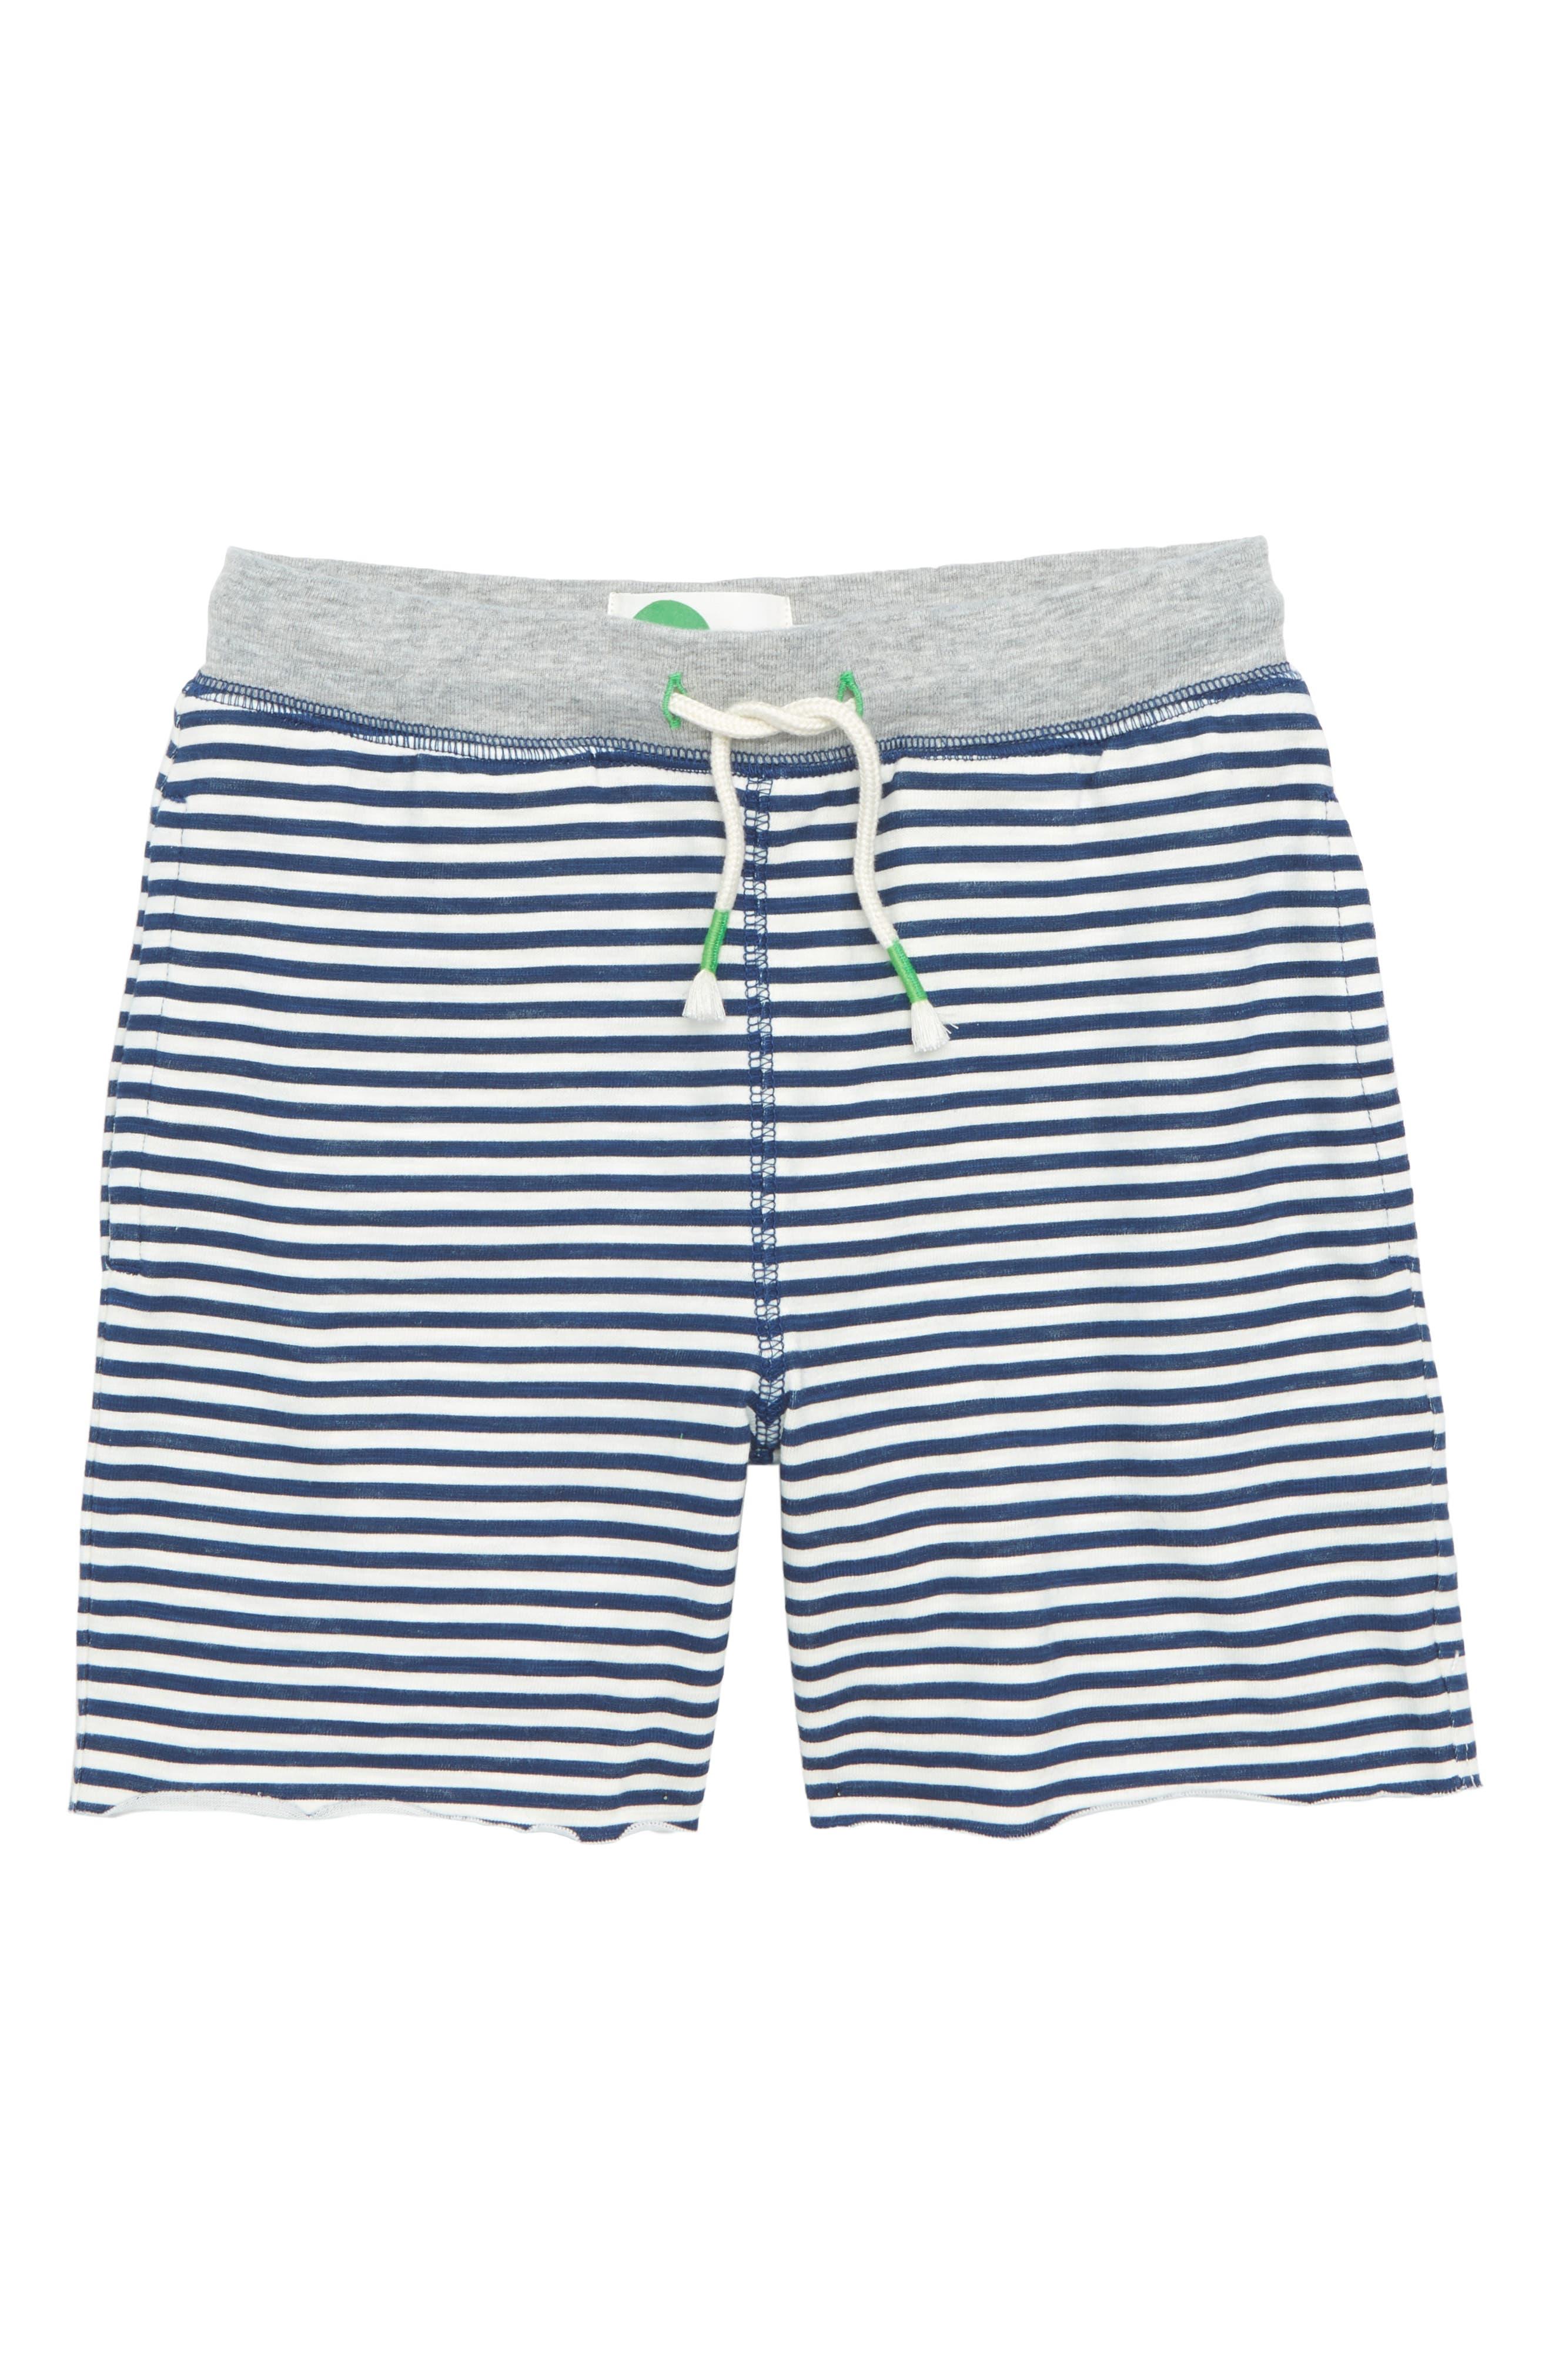 Slub Jersey Shorts,                             Main thumbnail 1, color,                             Beacon Blue/ Ivory